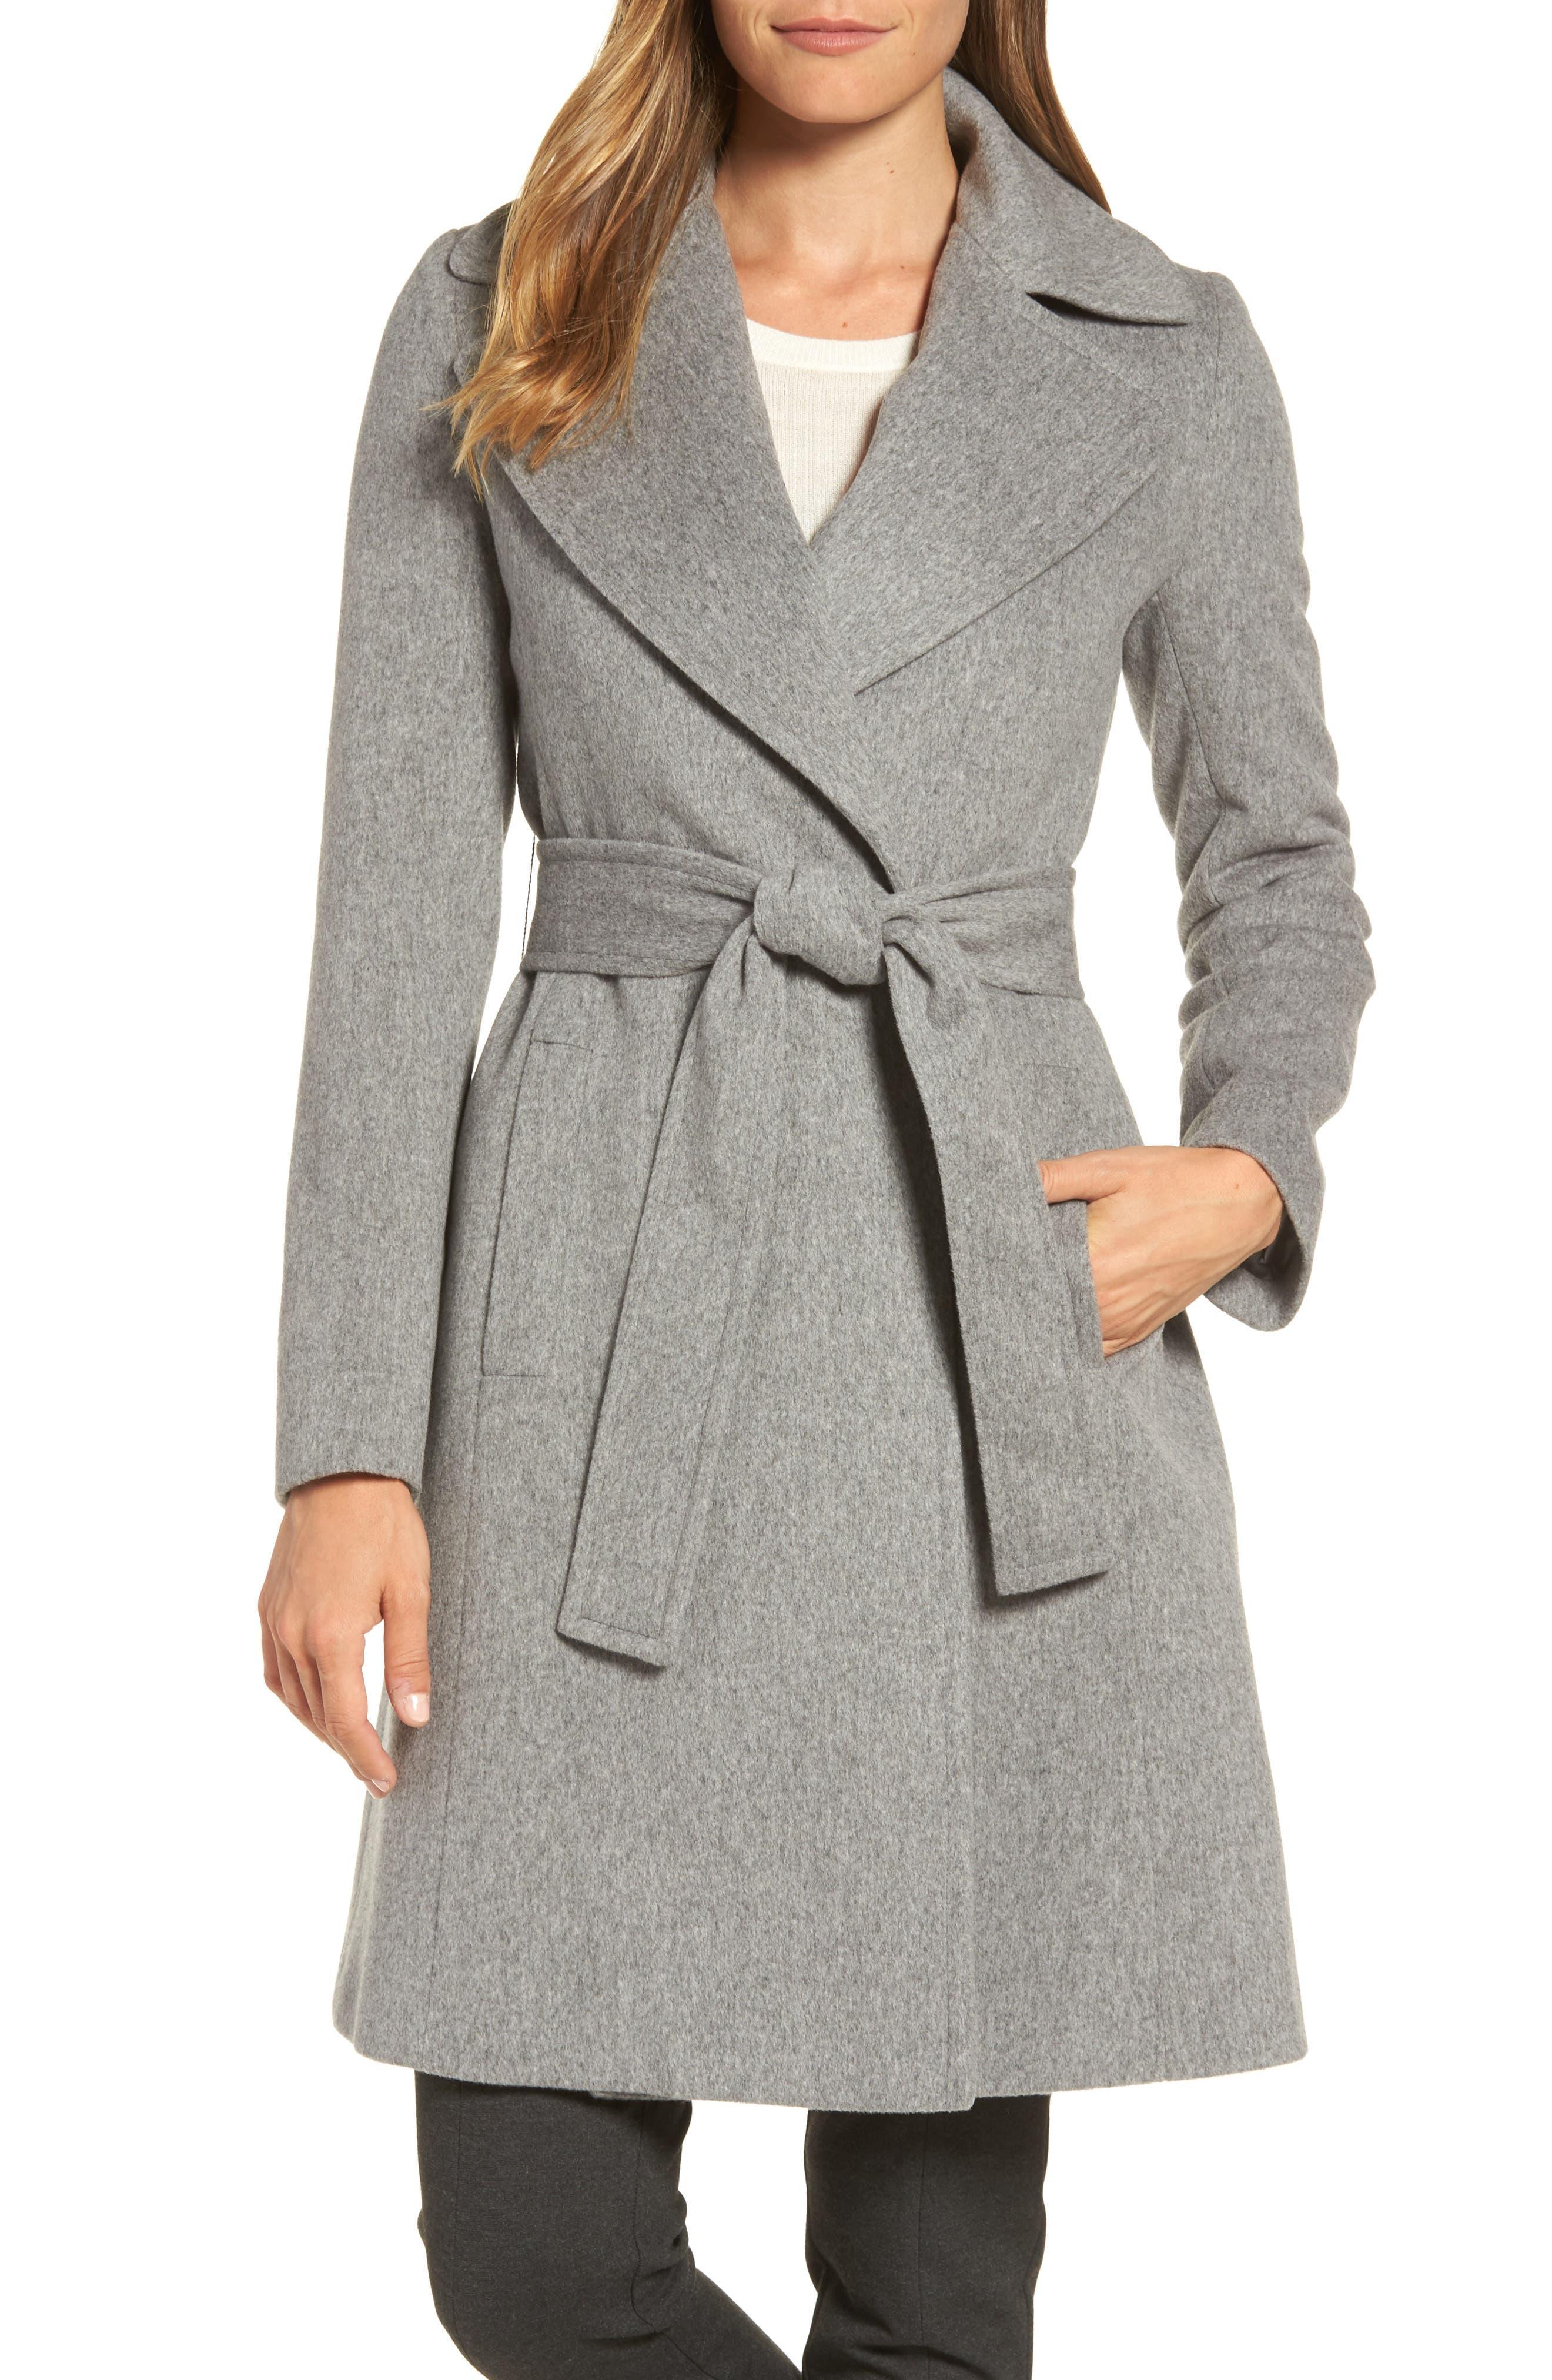 Wool Wrap Coat,                         Main,                         color, Grey/ Heather